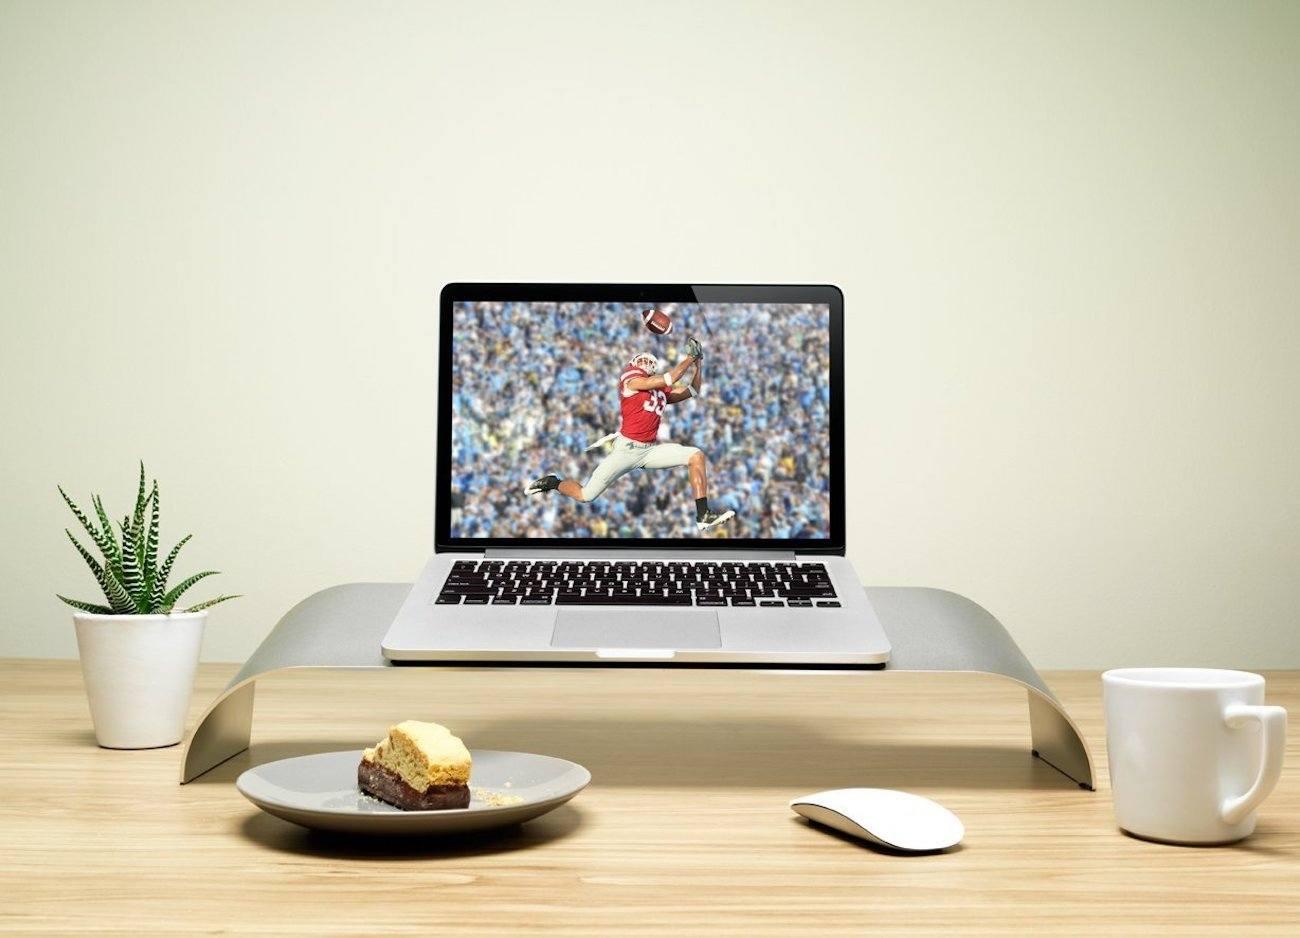 Arch+Aluminum+Laptop+Stand